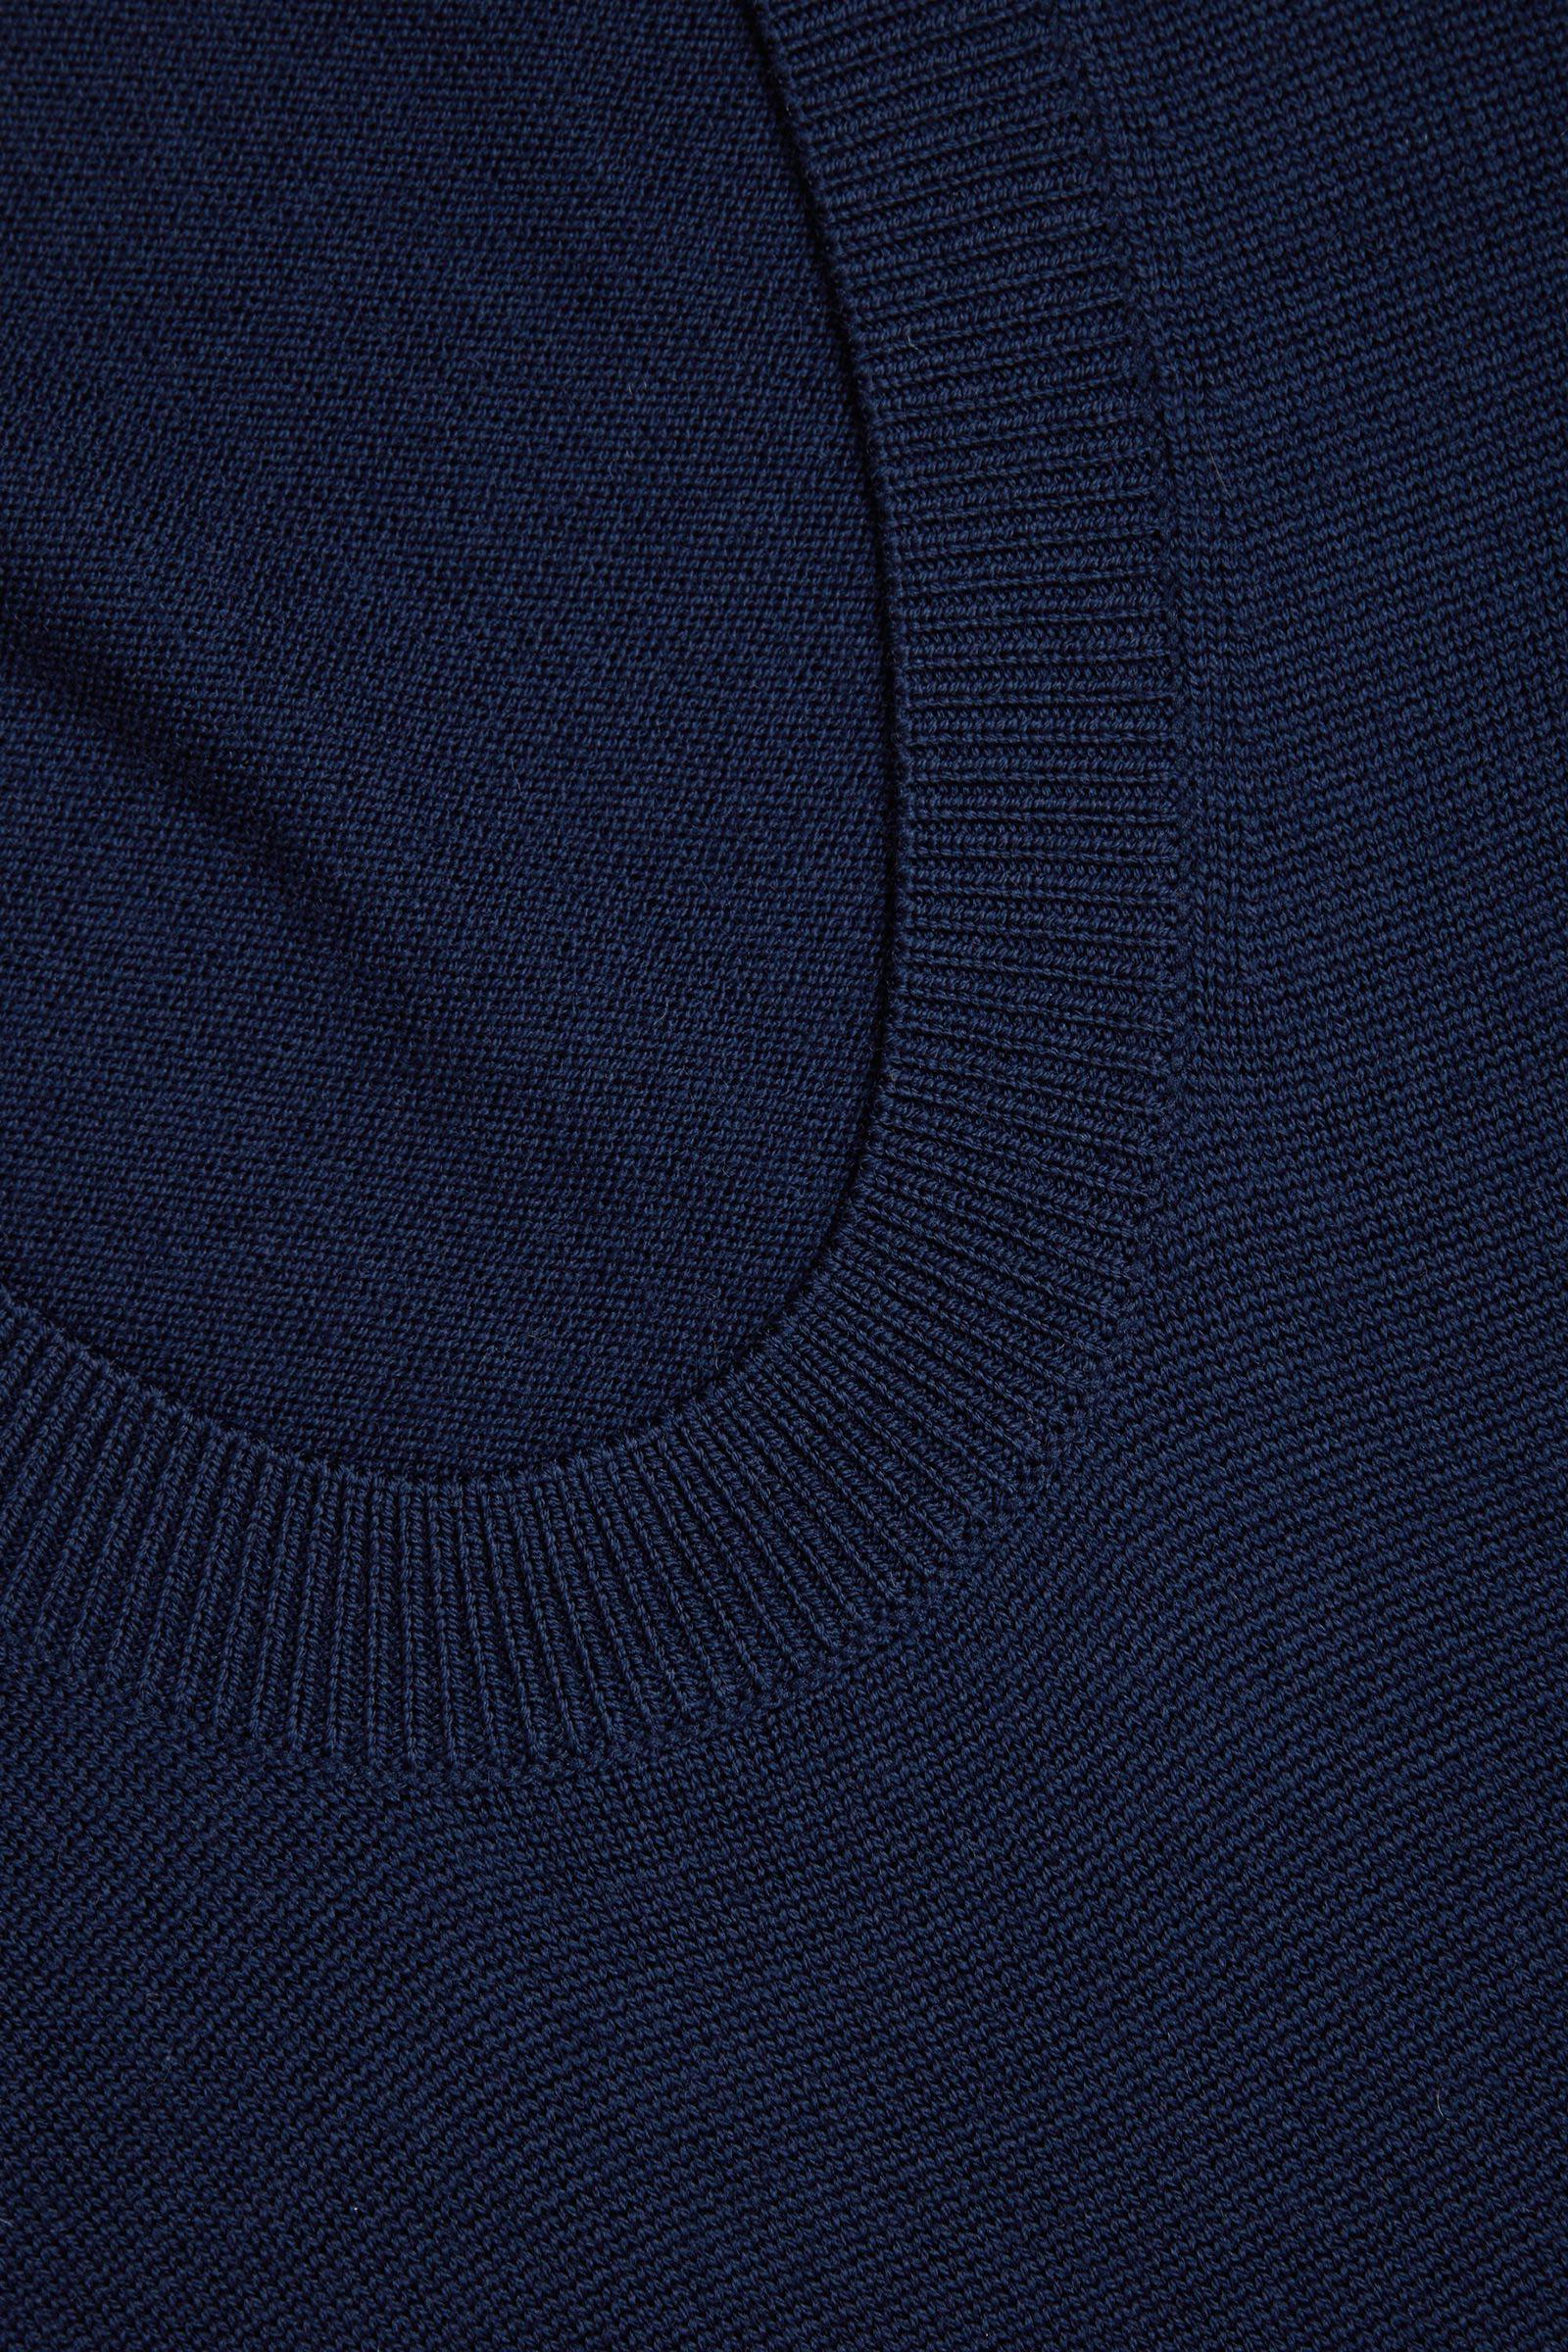 COS A라인 롱 슬리브 니티드 드레스의 블루컬러 Detail입니다.